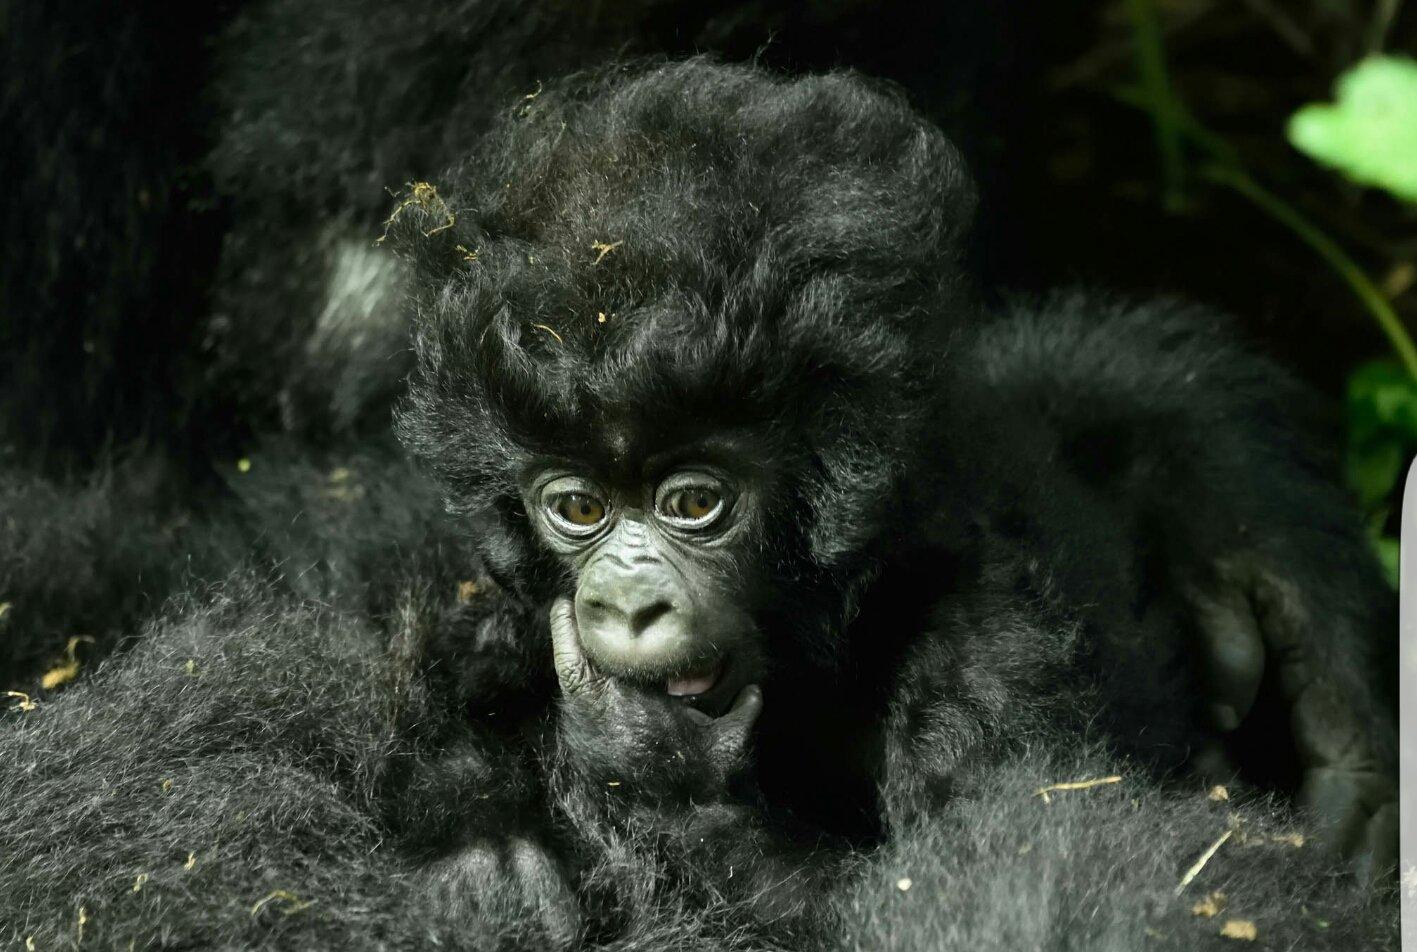 Luxury Gorilla Tours in Rwanda